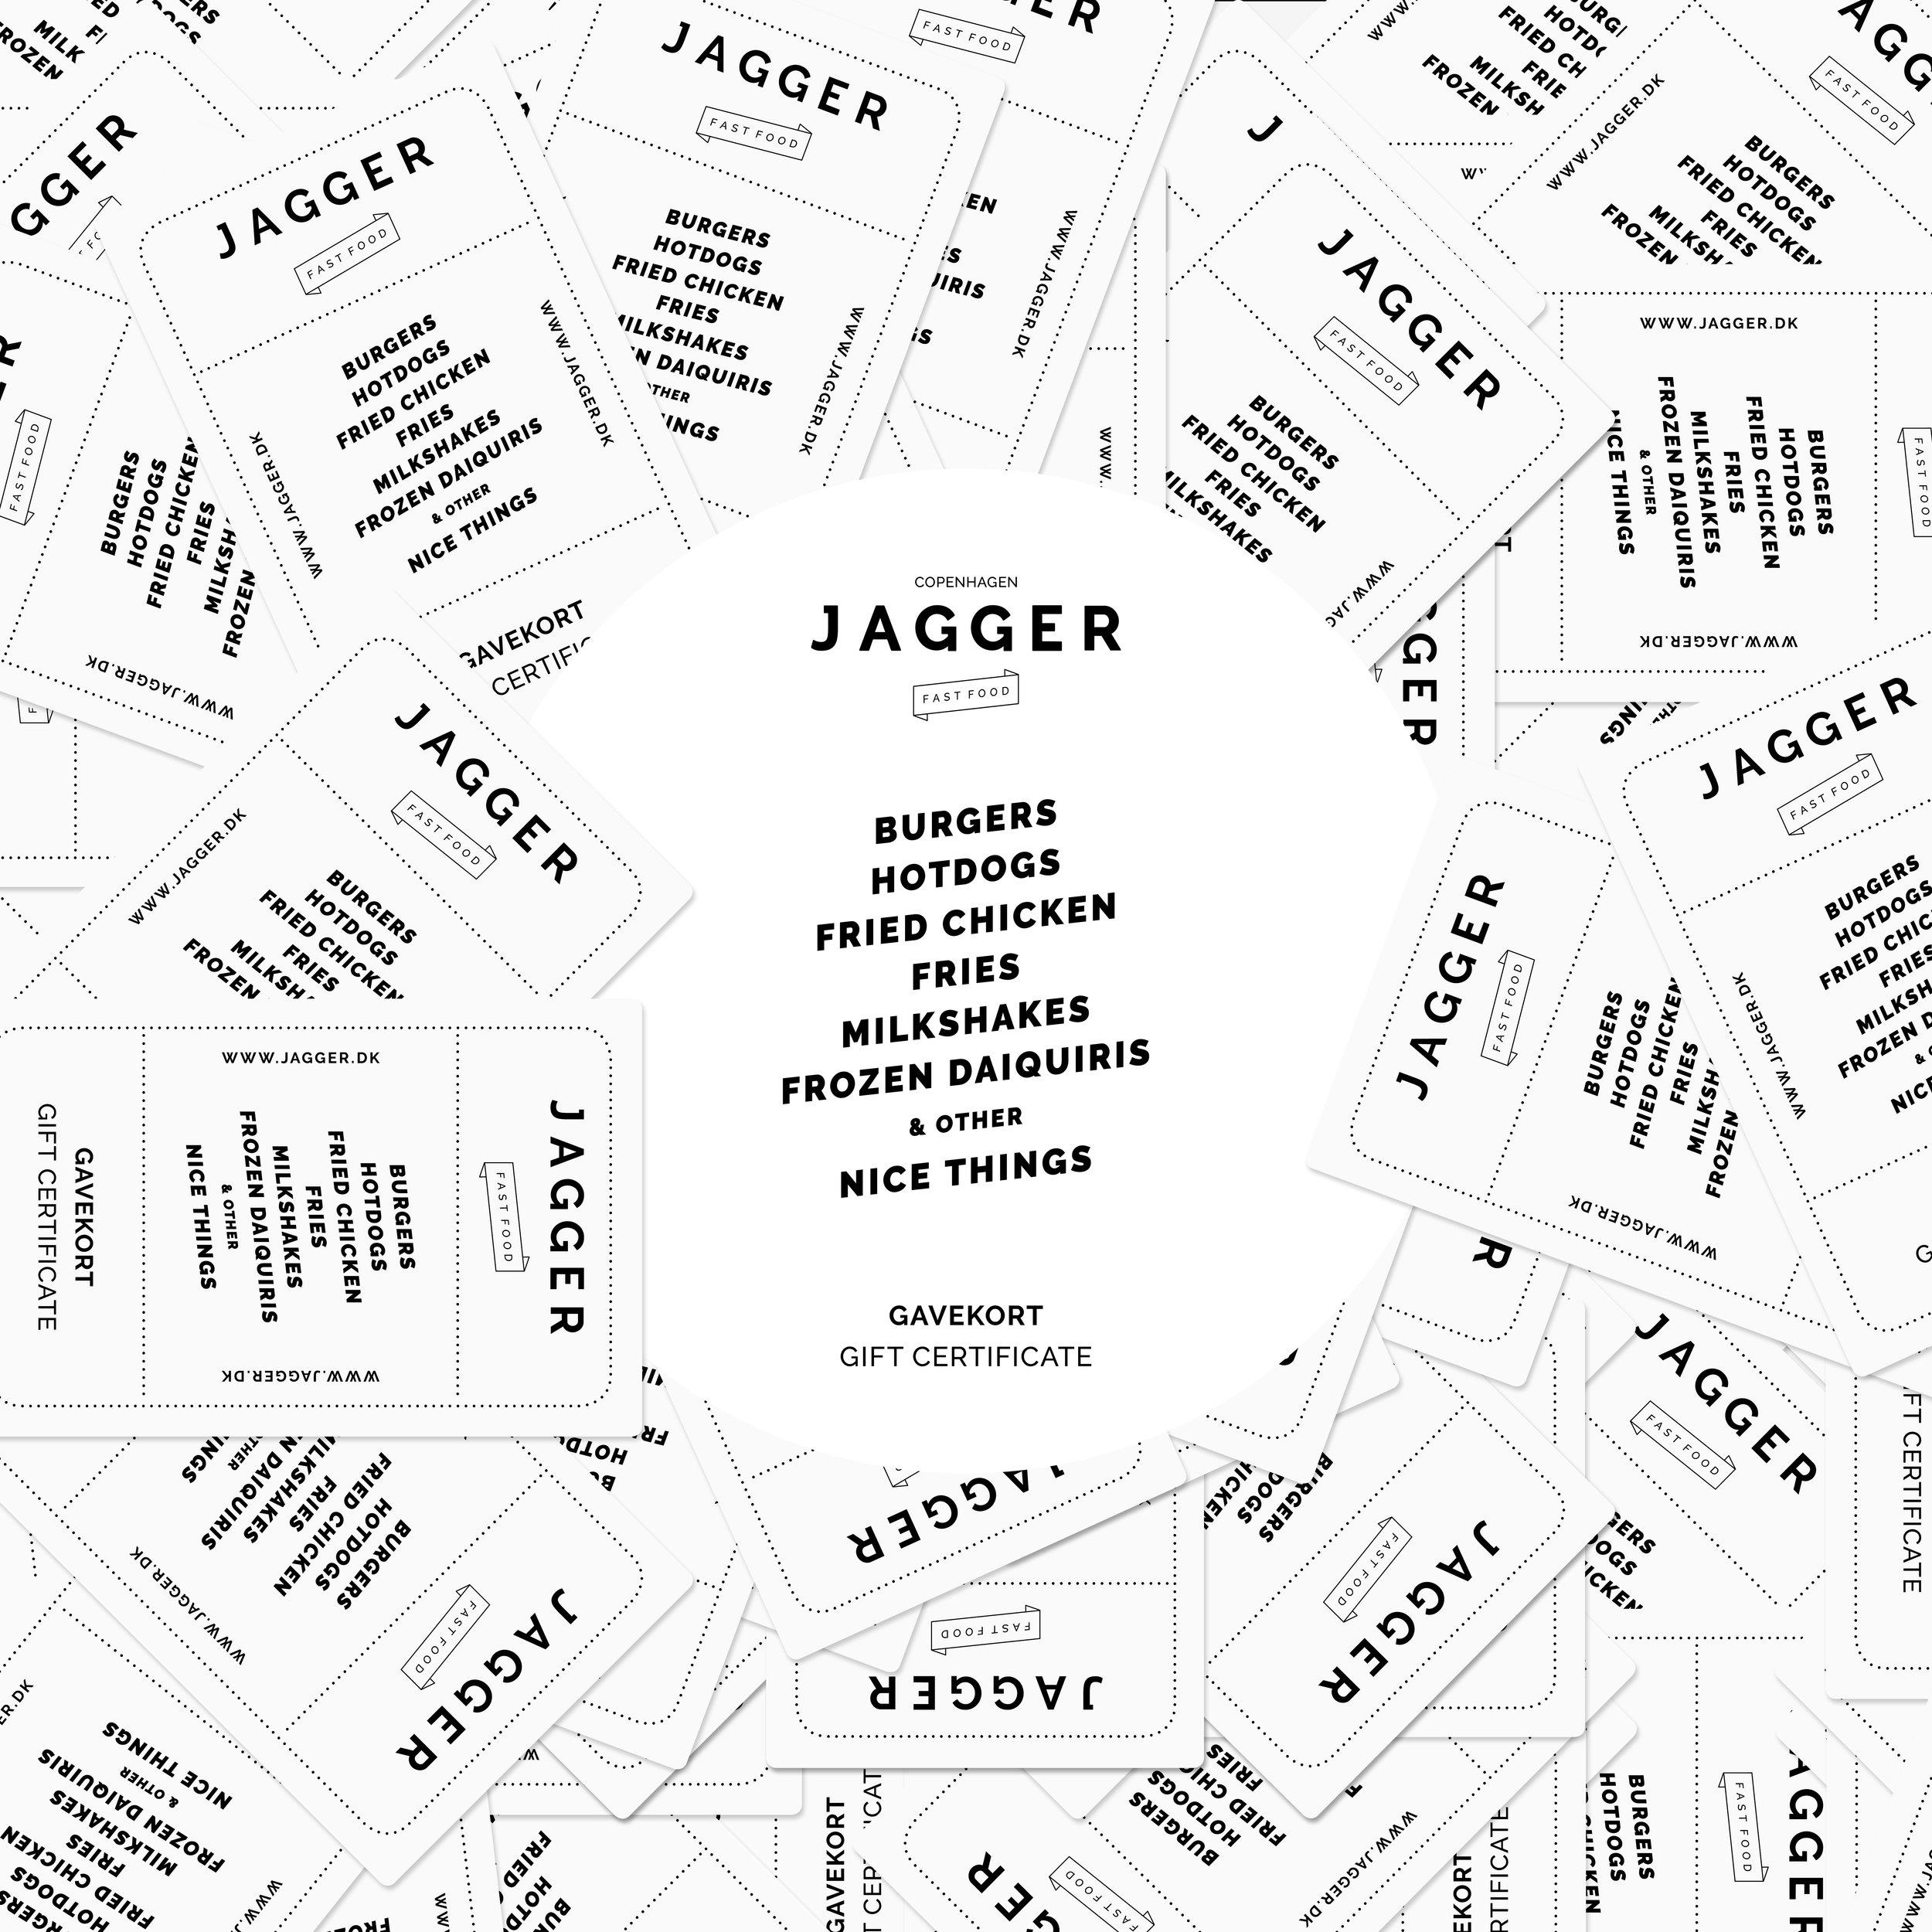 jagger_copenhagen_dk_giftcard.jpg